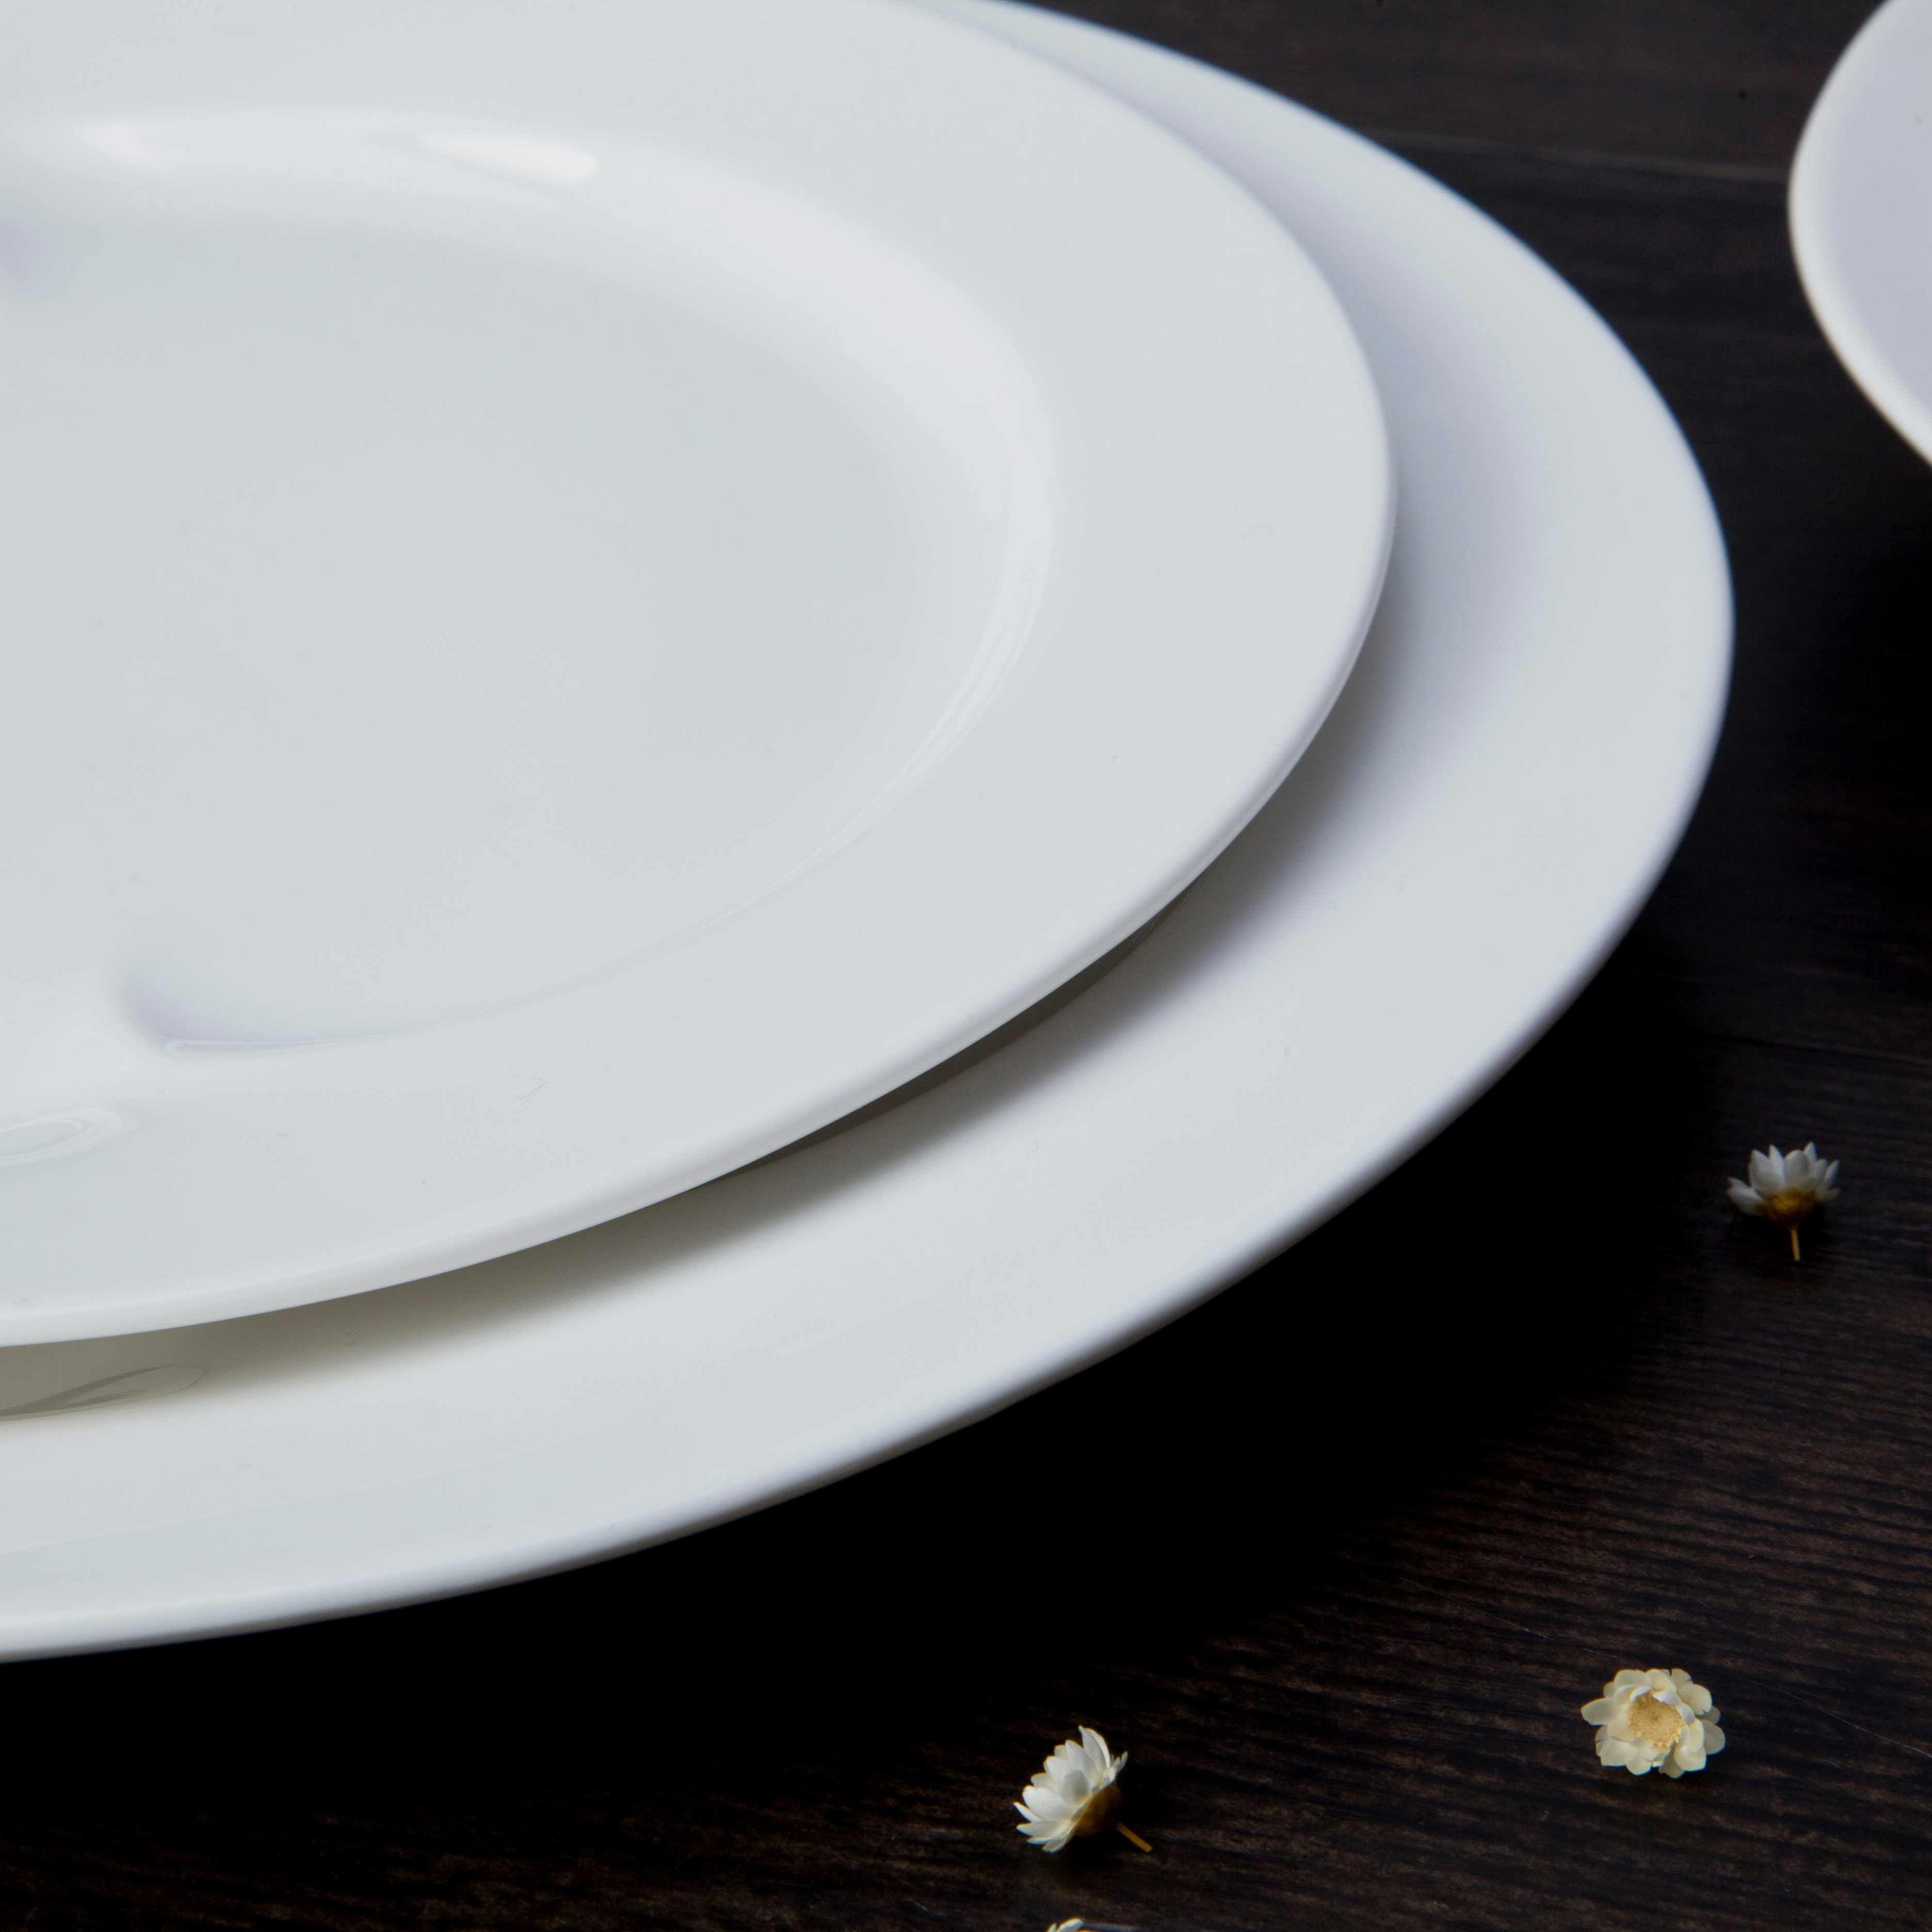 Best White Porcelain Plates Ideas And Design Gallery 10 Piece Restaurant White Ceramic Dinnerware Ceramic Dinnerware Ceramic Dinnerware Set Ceramic Dinner Set